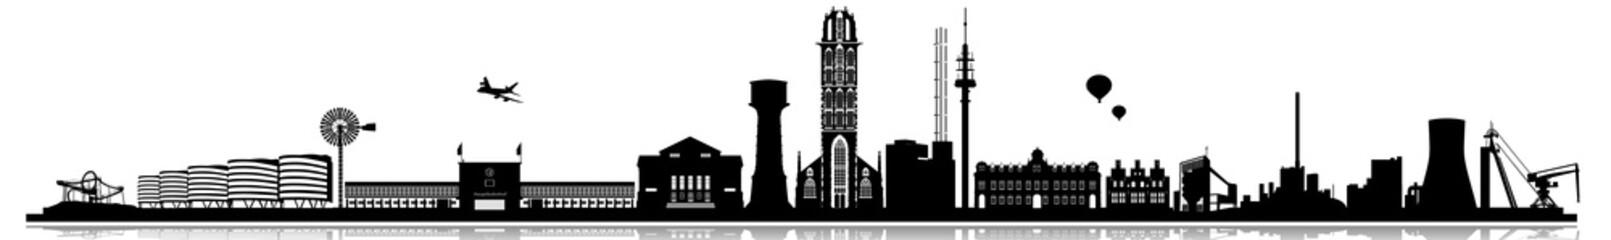 Duisburg skyline